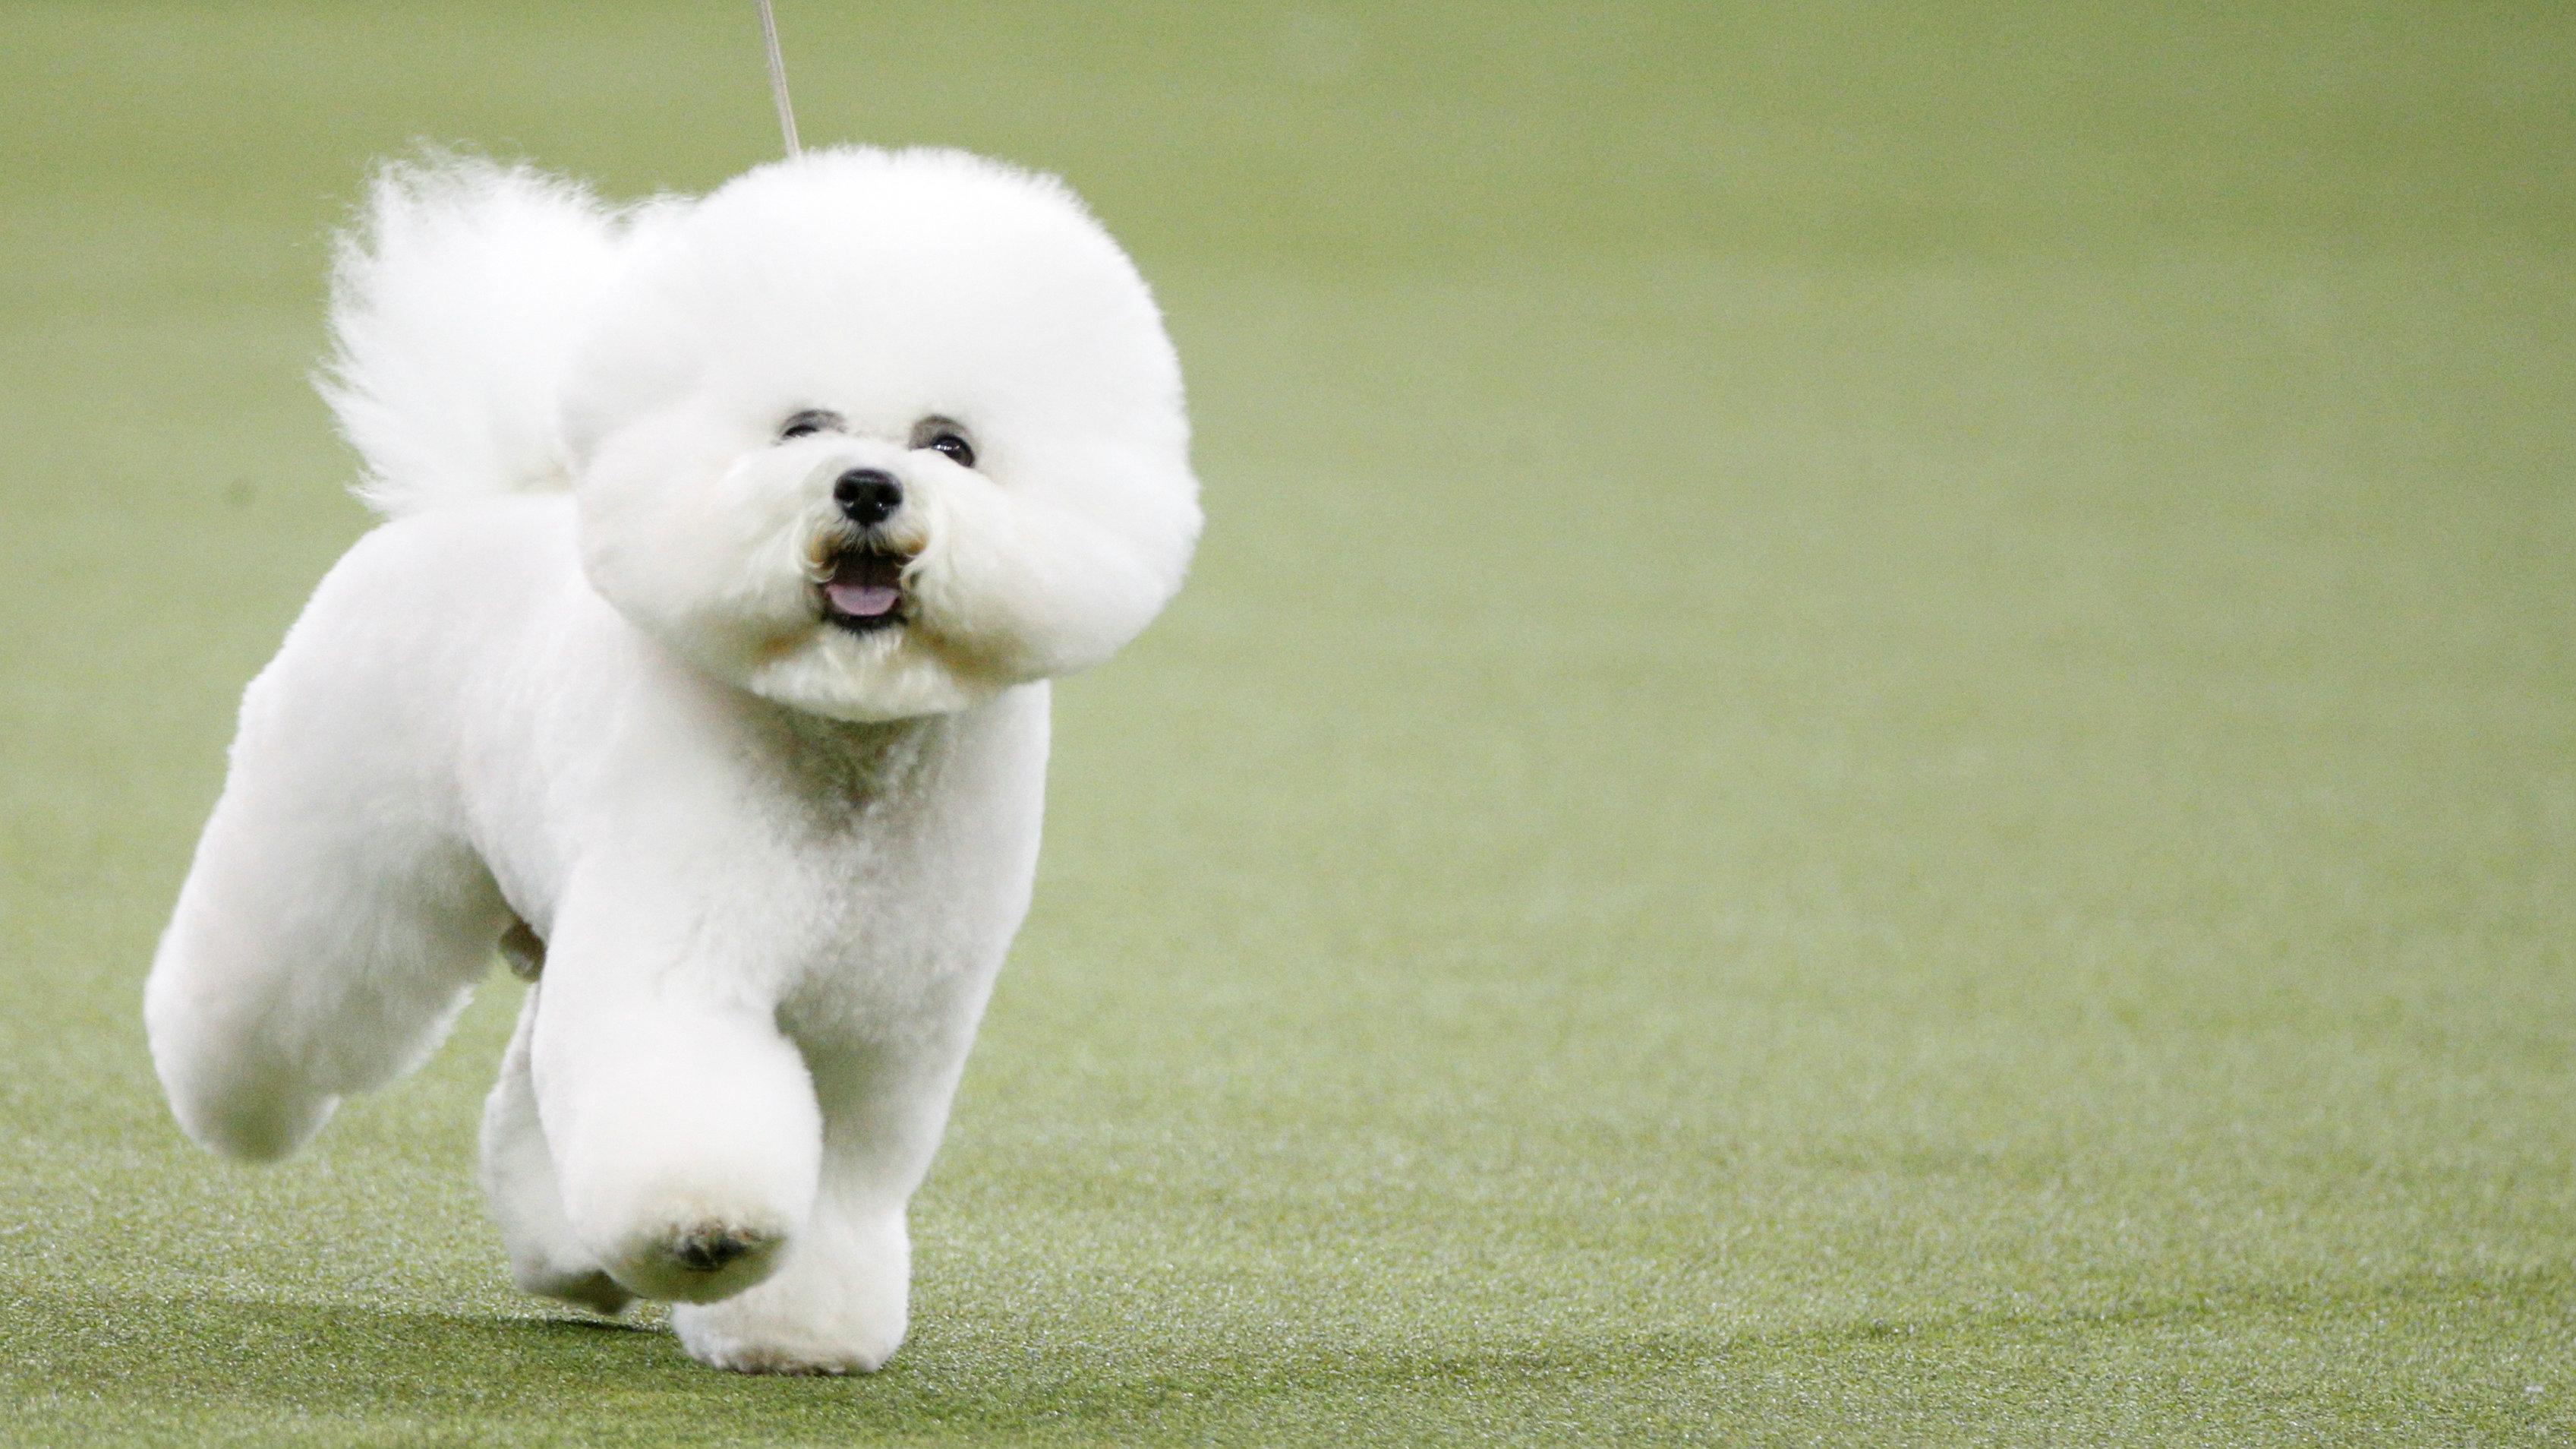 Westminster Dog Show 2020 Results.Your Westminster Kennel Club Dog Show 2019 Fact Sheet Quartz